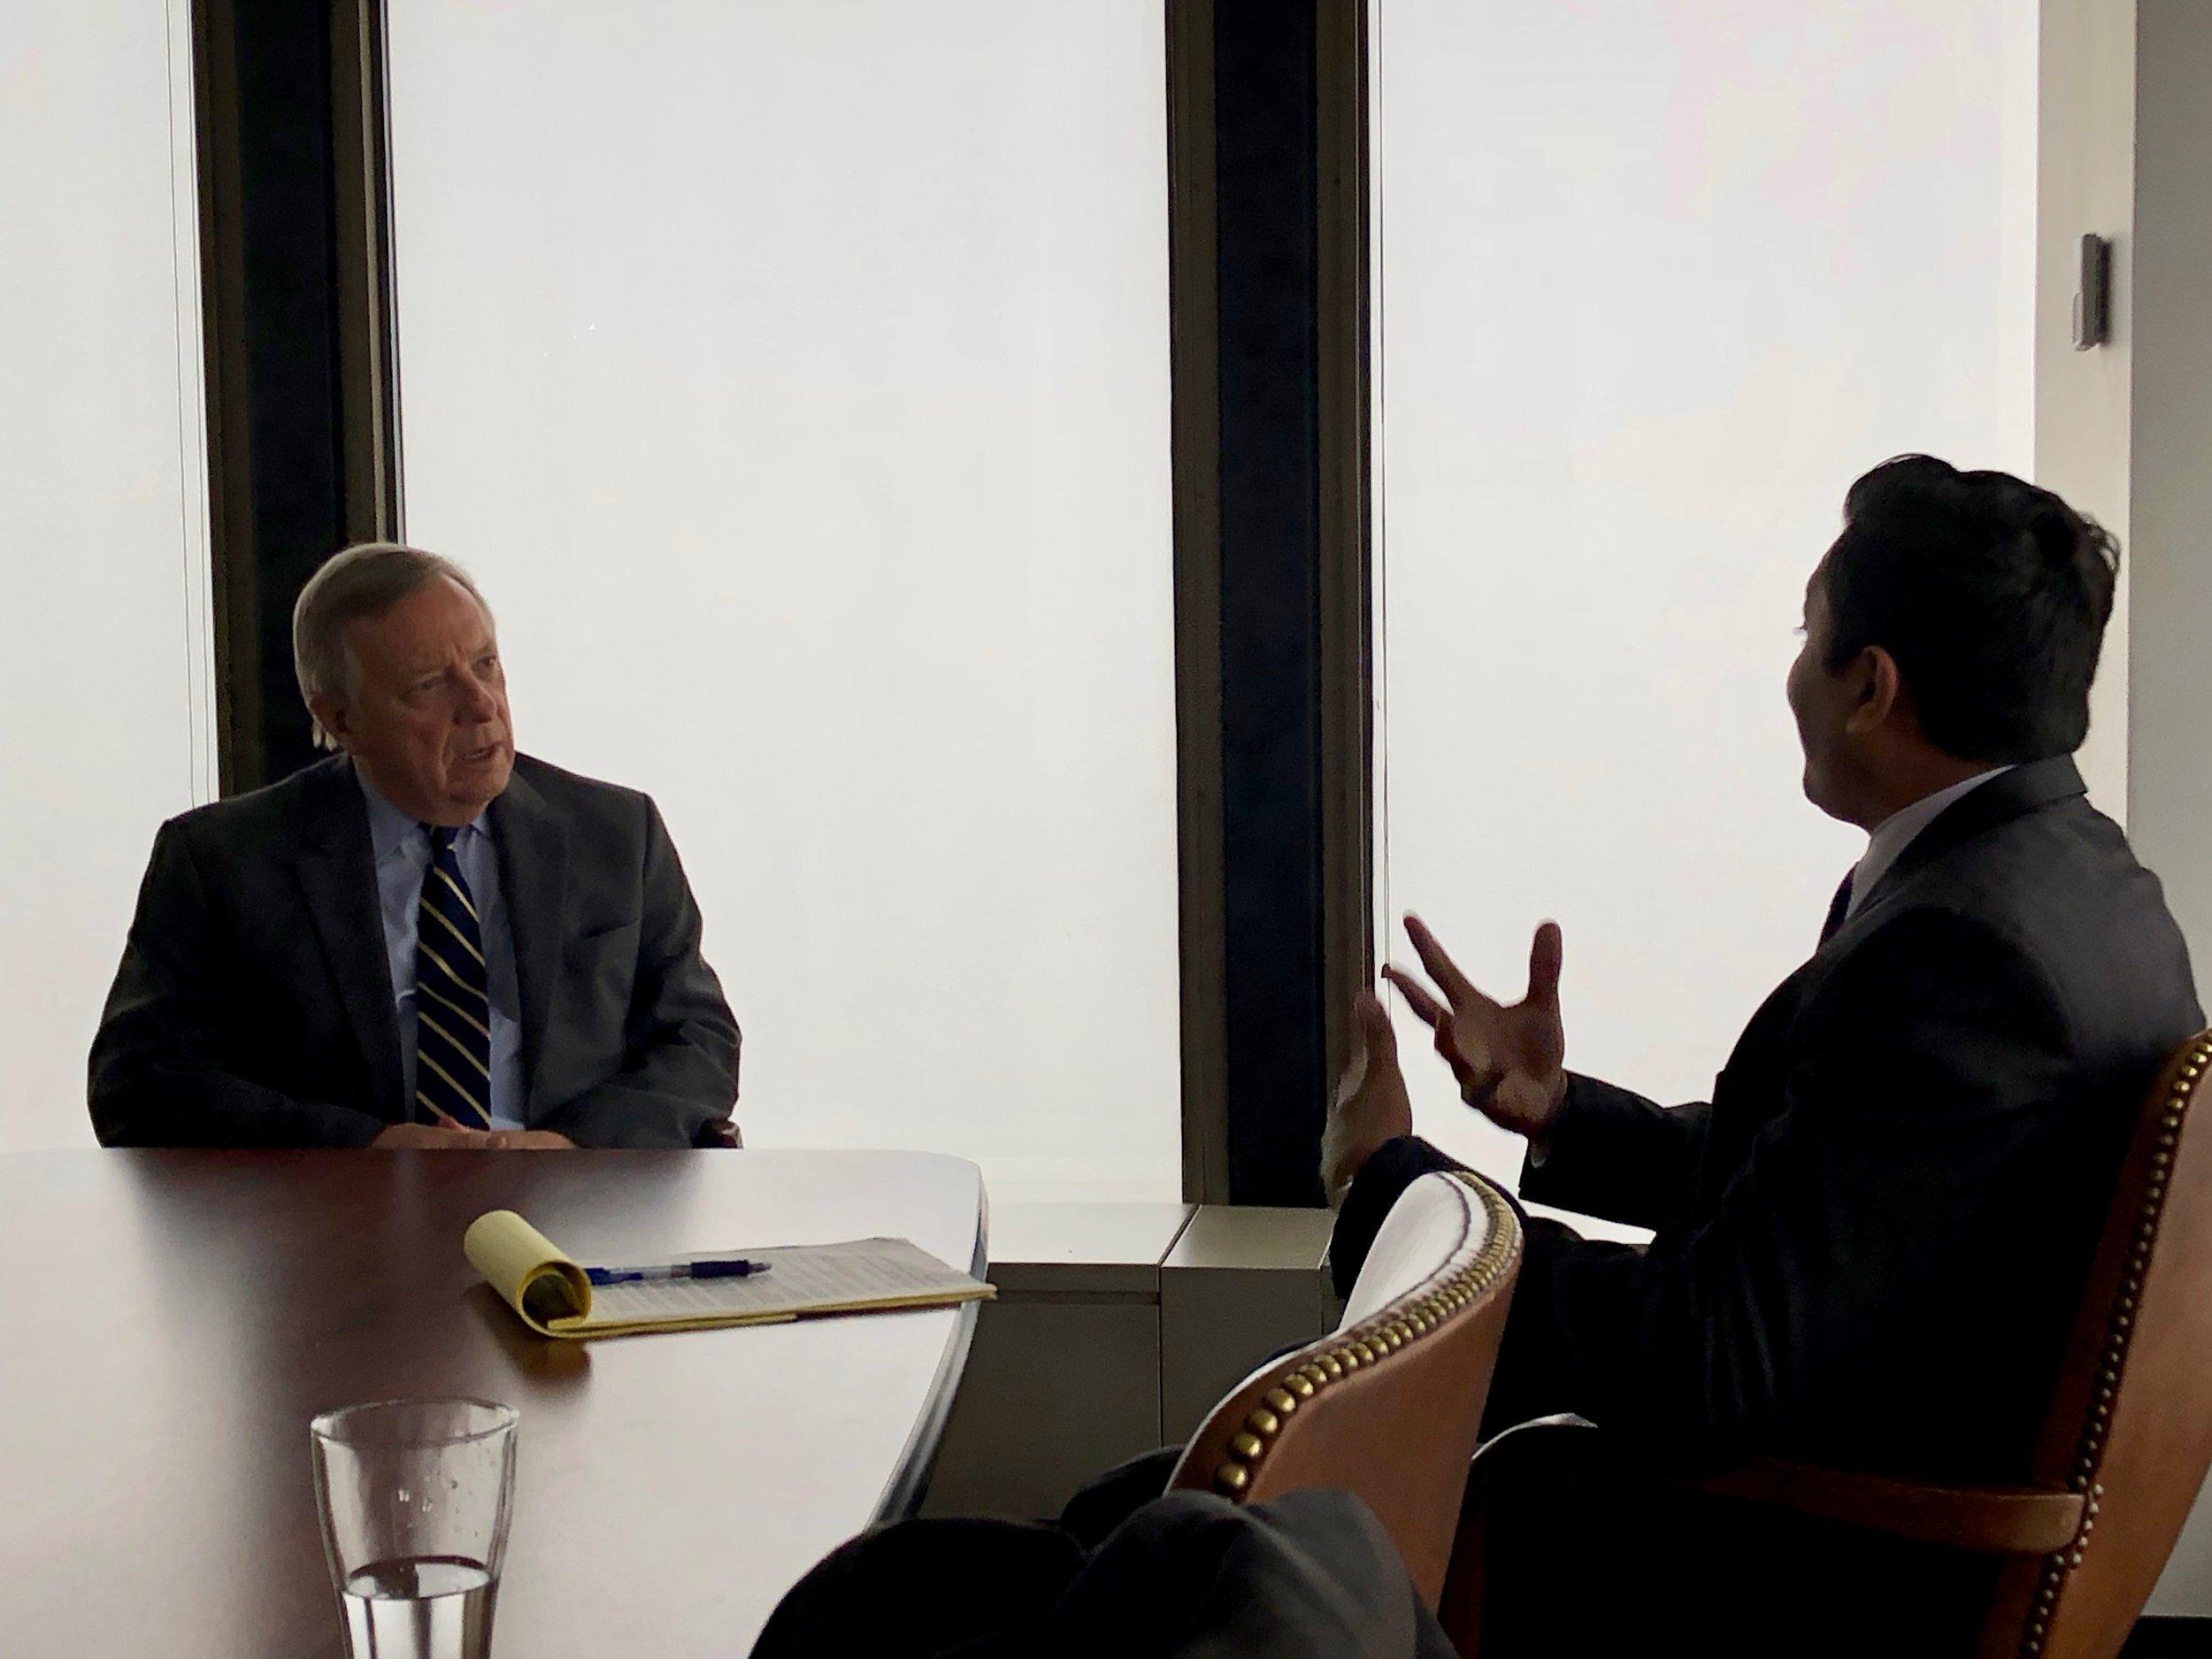 U.S. Sen. Dick Durbin and Alderman Ameya Pawar talk at Durbin's office in downtown Chicago. (One Illinois/Ted Cox)